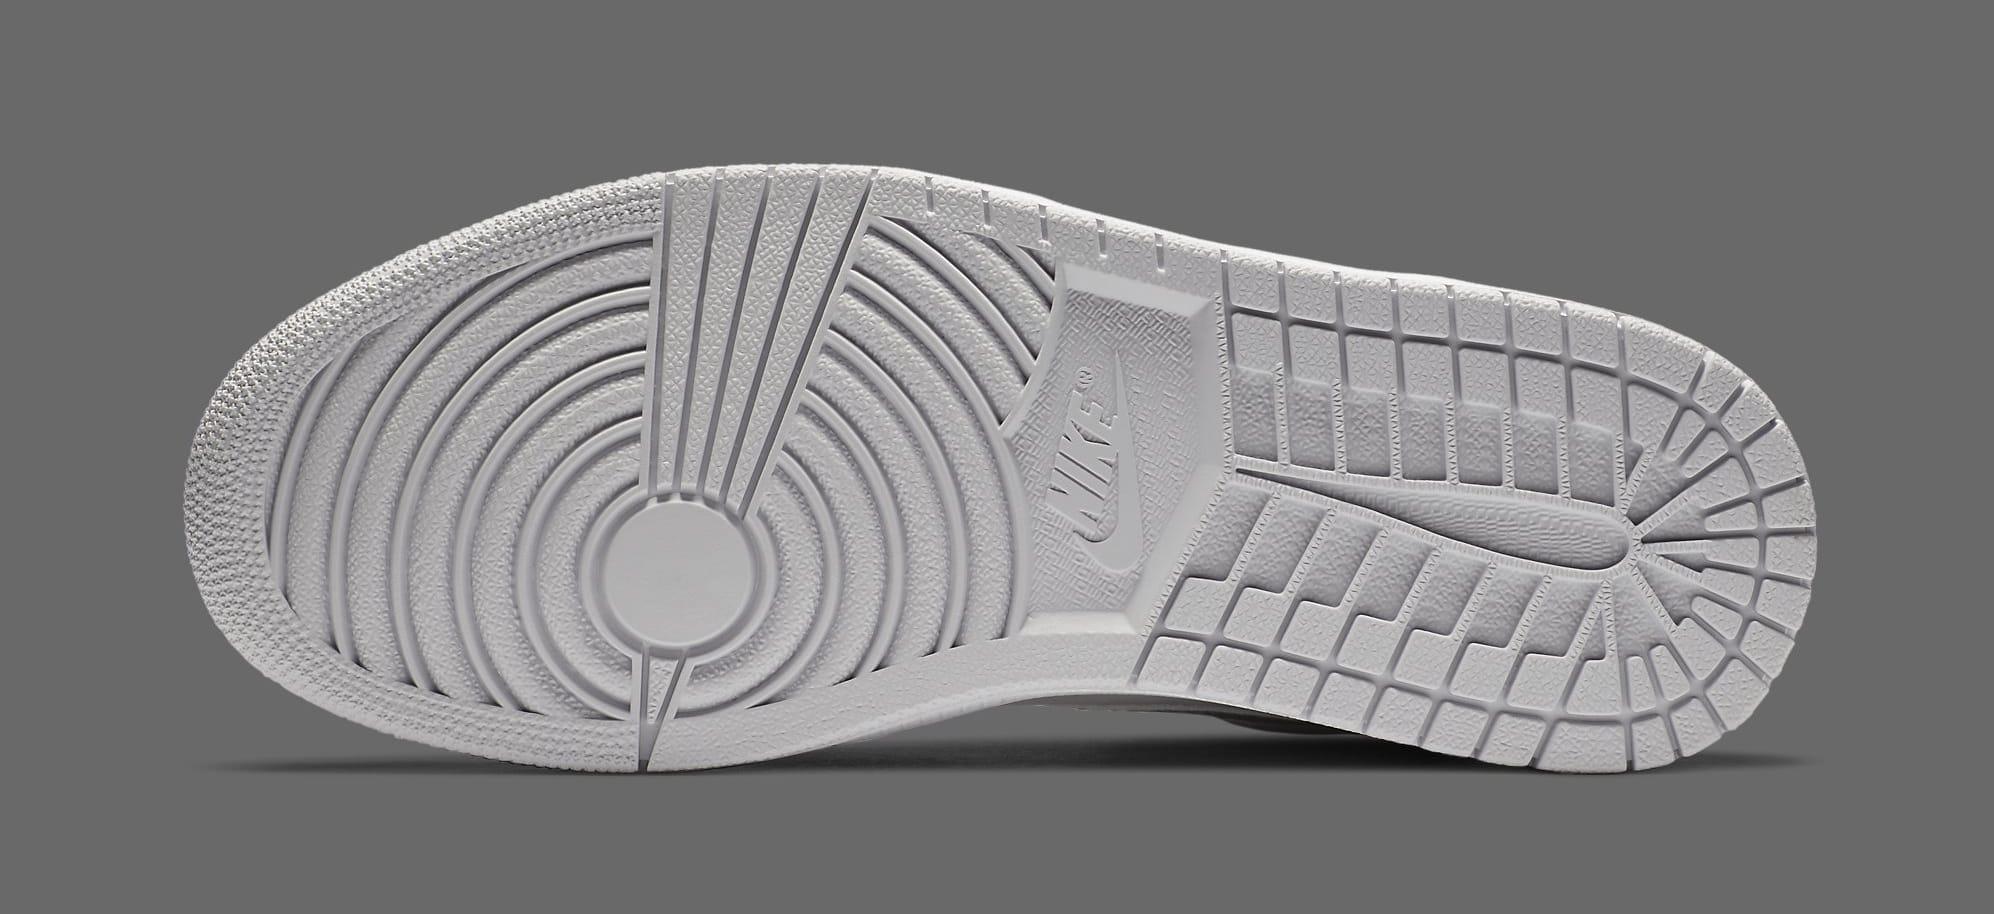 Air Jordan 1 Retro High Og Co Jp Metallic Silver Release Date Da0382 029 Sole Collector